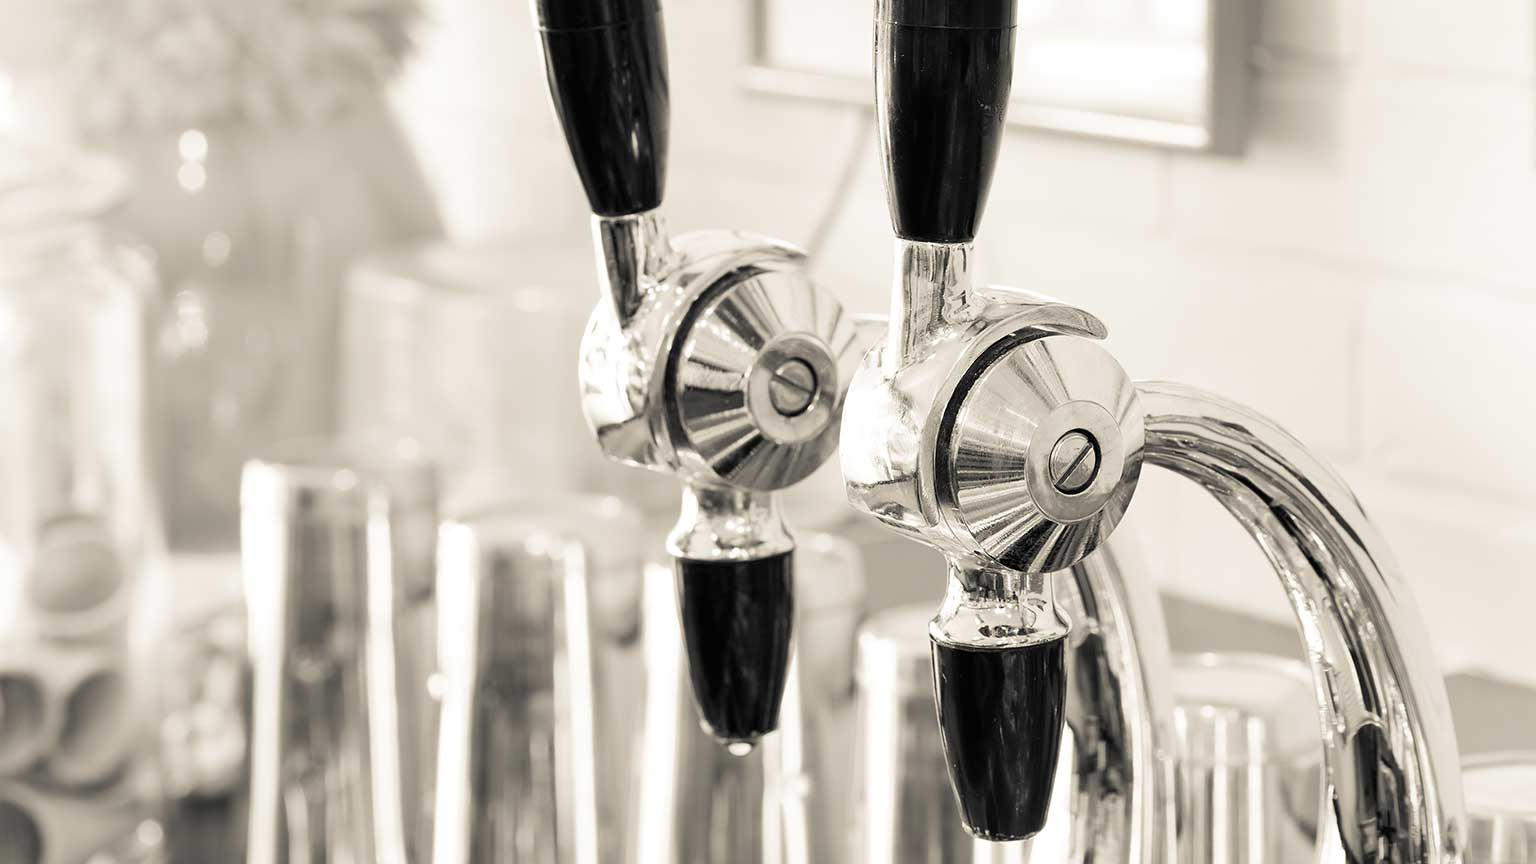 Soda fountain draft spigots